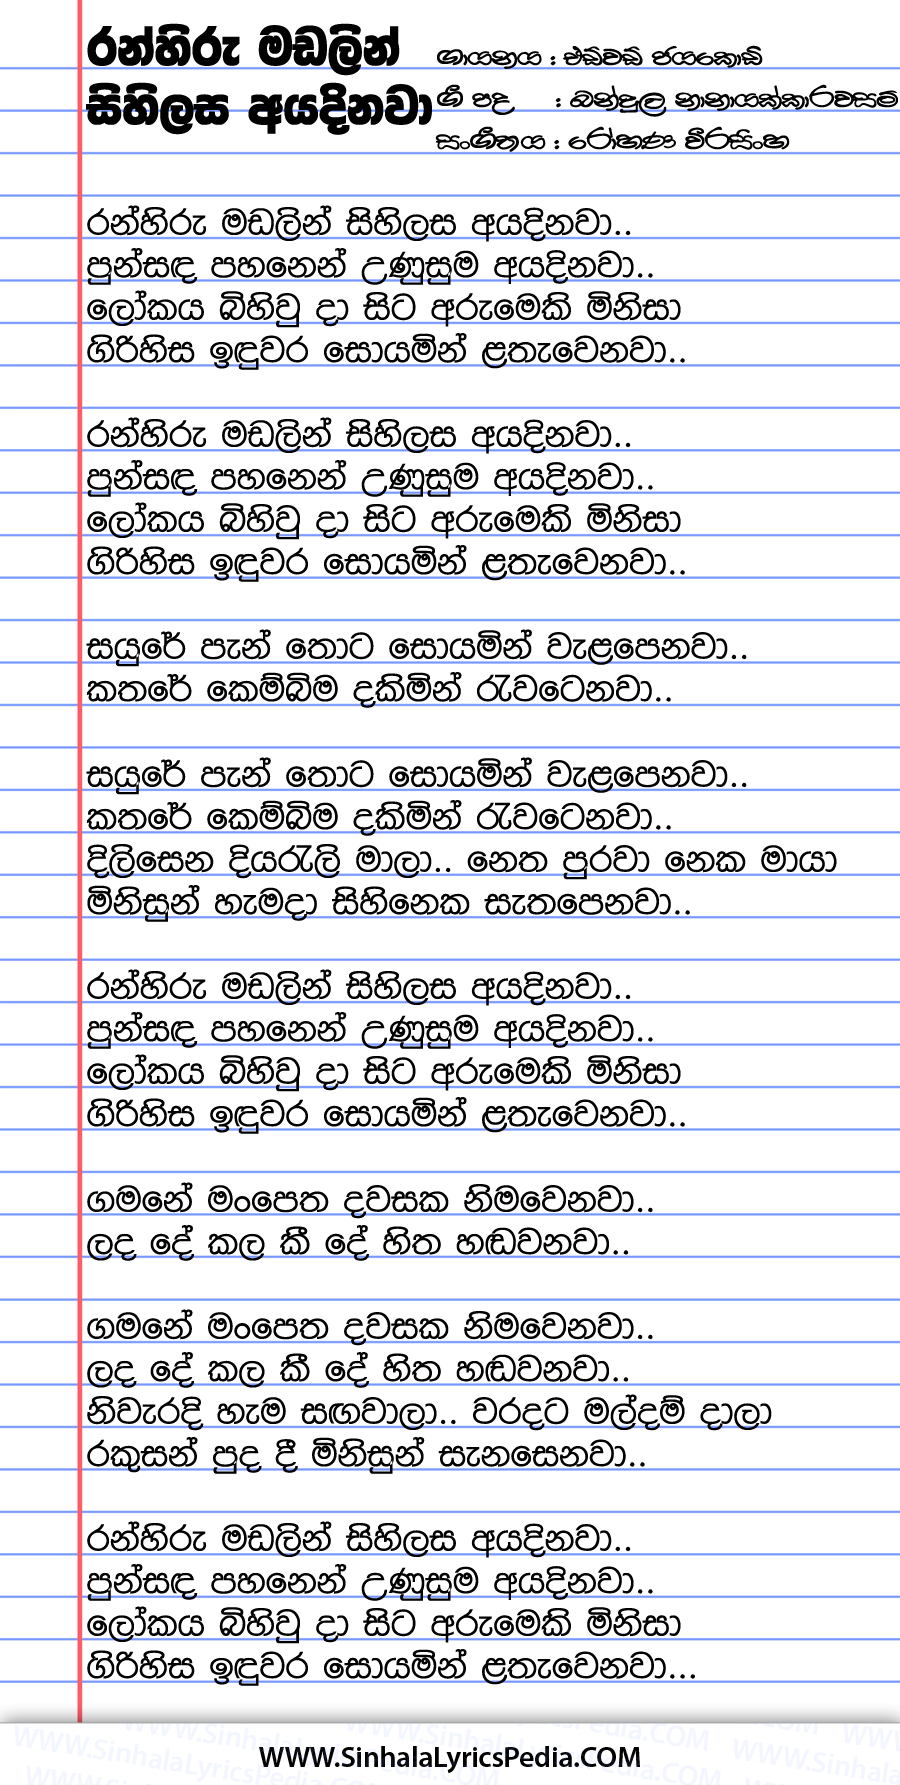 Ran Hiru Madalin Sihilasa Ayadinawa Song Lyrics